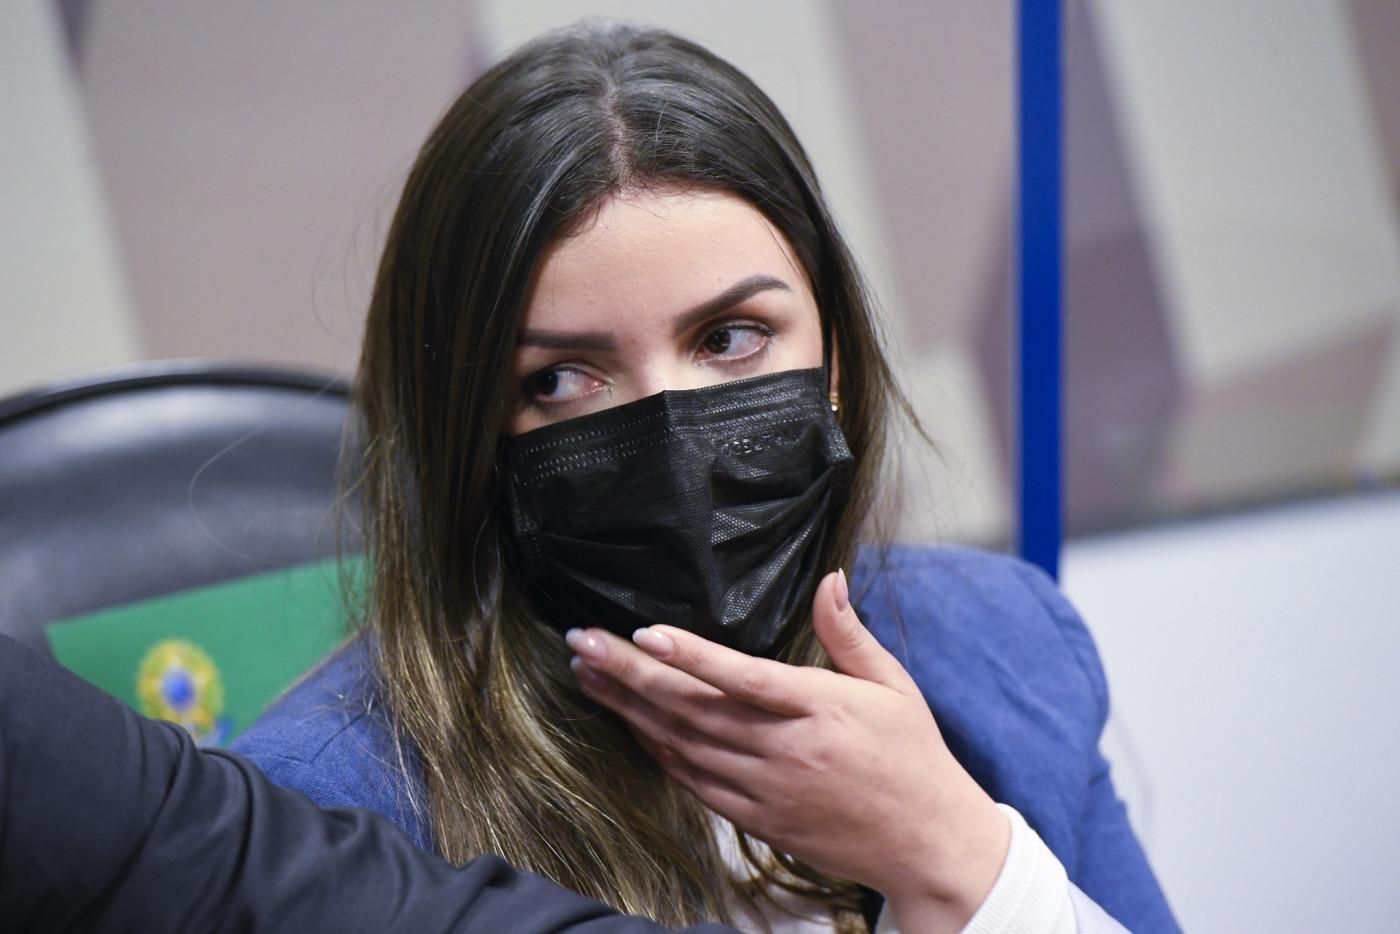 Depoente de máscara auxiliada por advogados